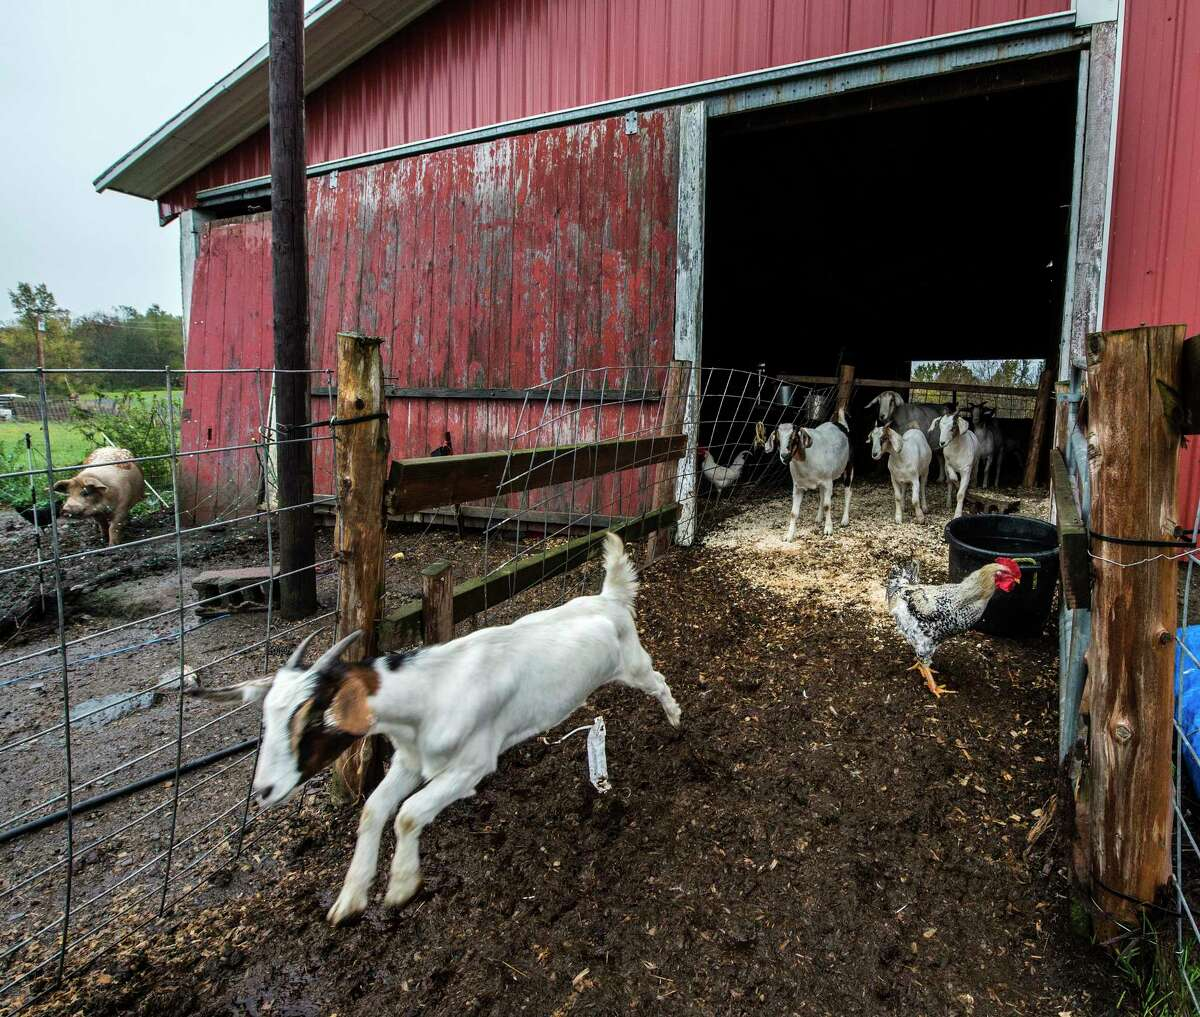 Farm animals enjoy their day at the R'Eison Shine Farm Monday Oct. 9, 2017 in Schagticoke, N.Y. (Skip Dickstein/Times Union)